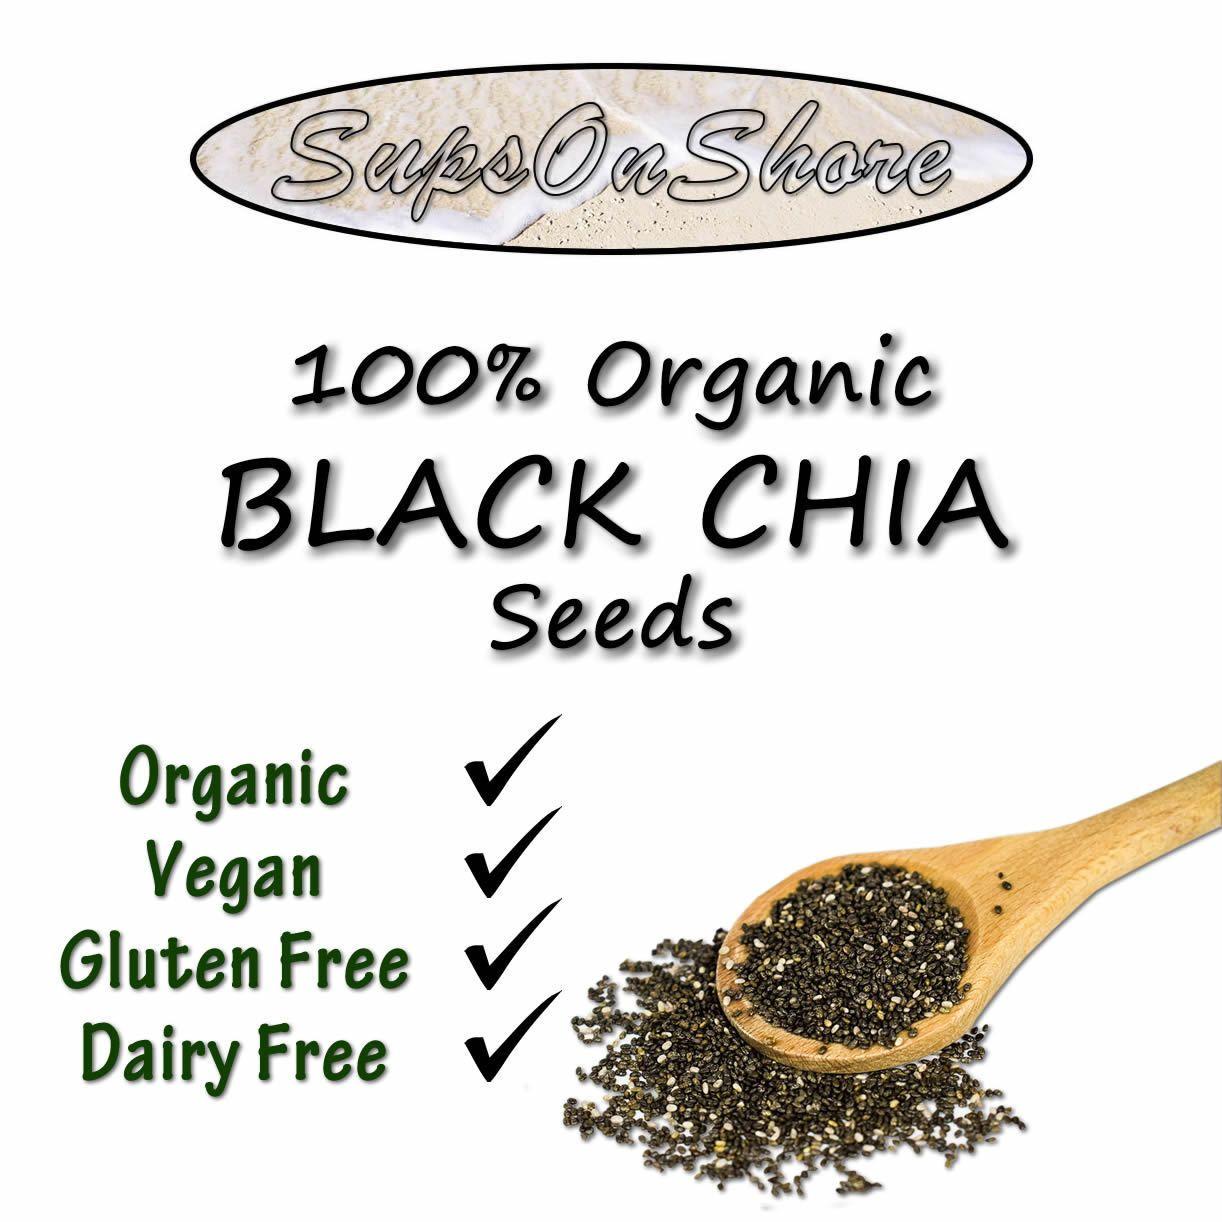 495 Aud 100 Organic Premium Black Chia Seeds 50g 125g 250g 1 Kg 500g 1kg 2kg 4kg